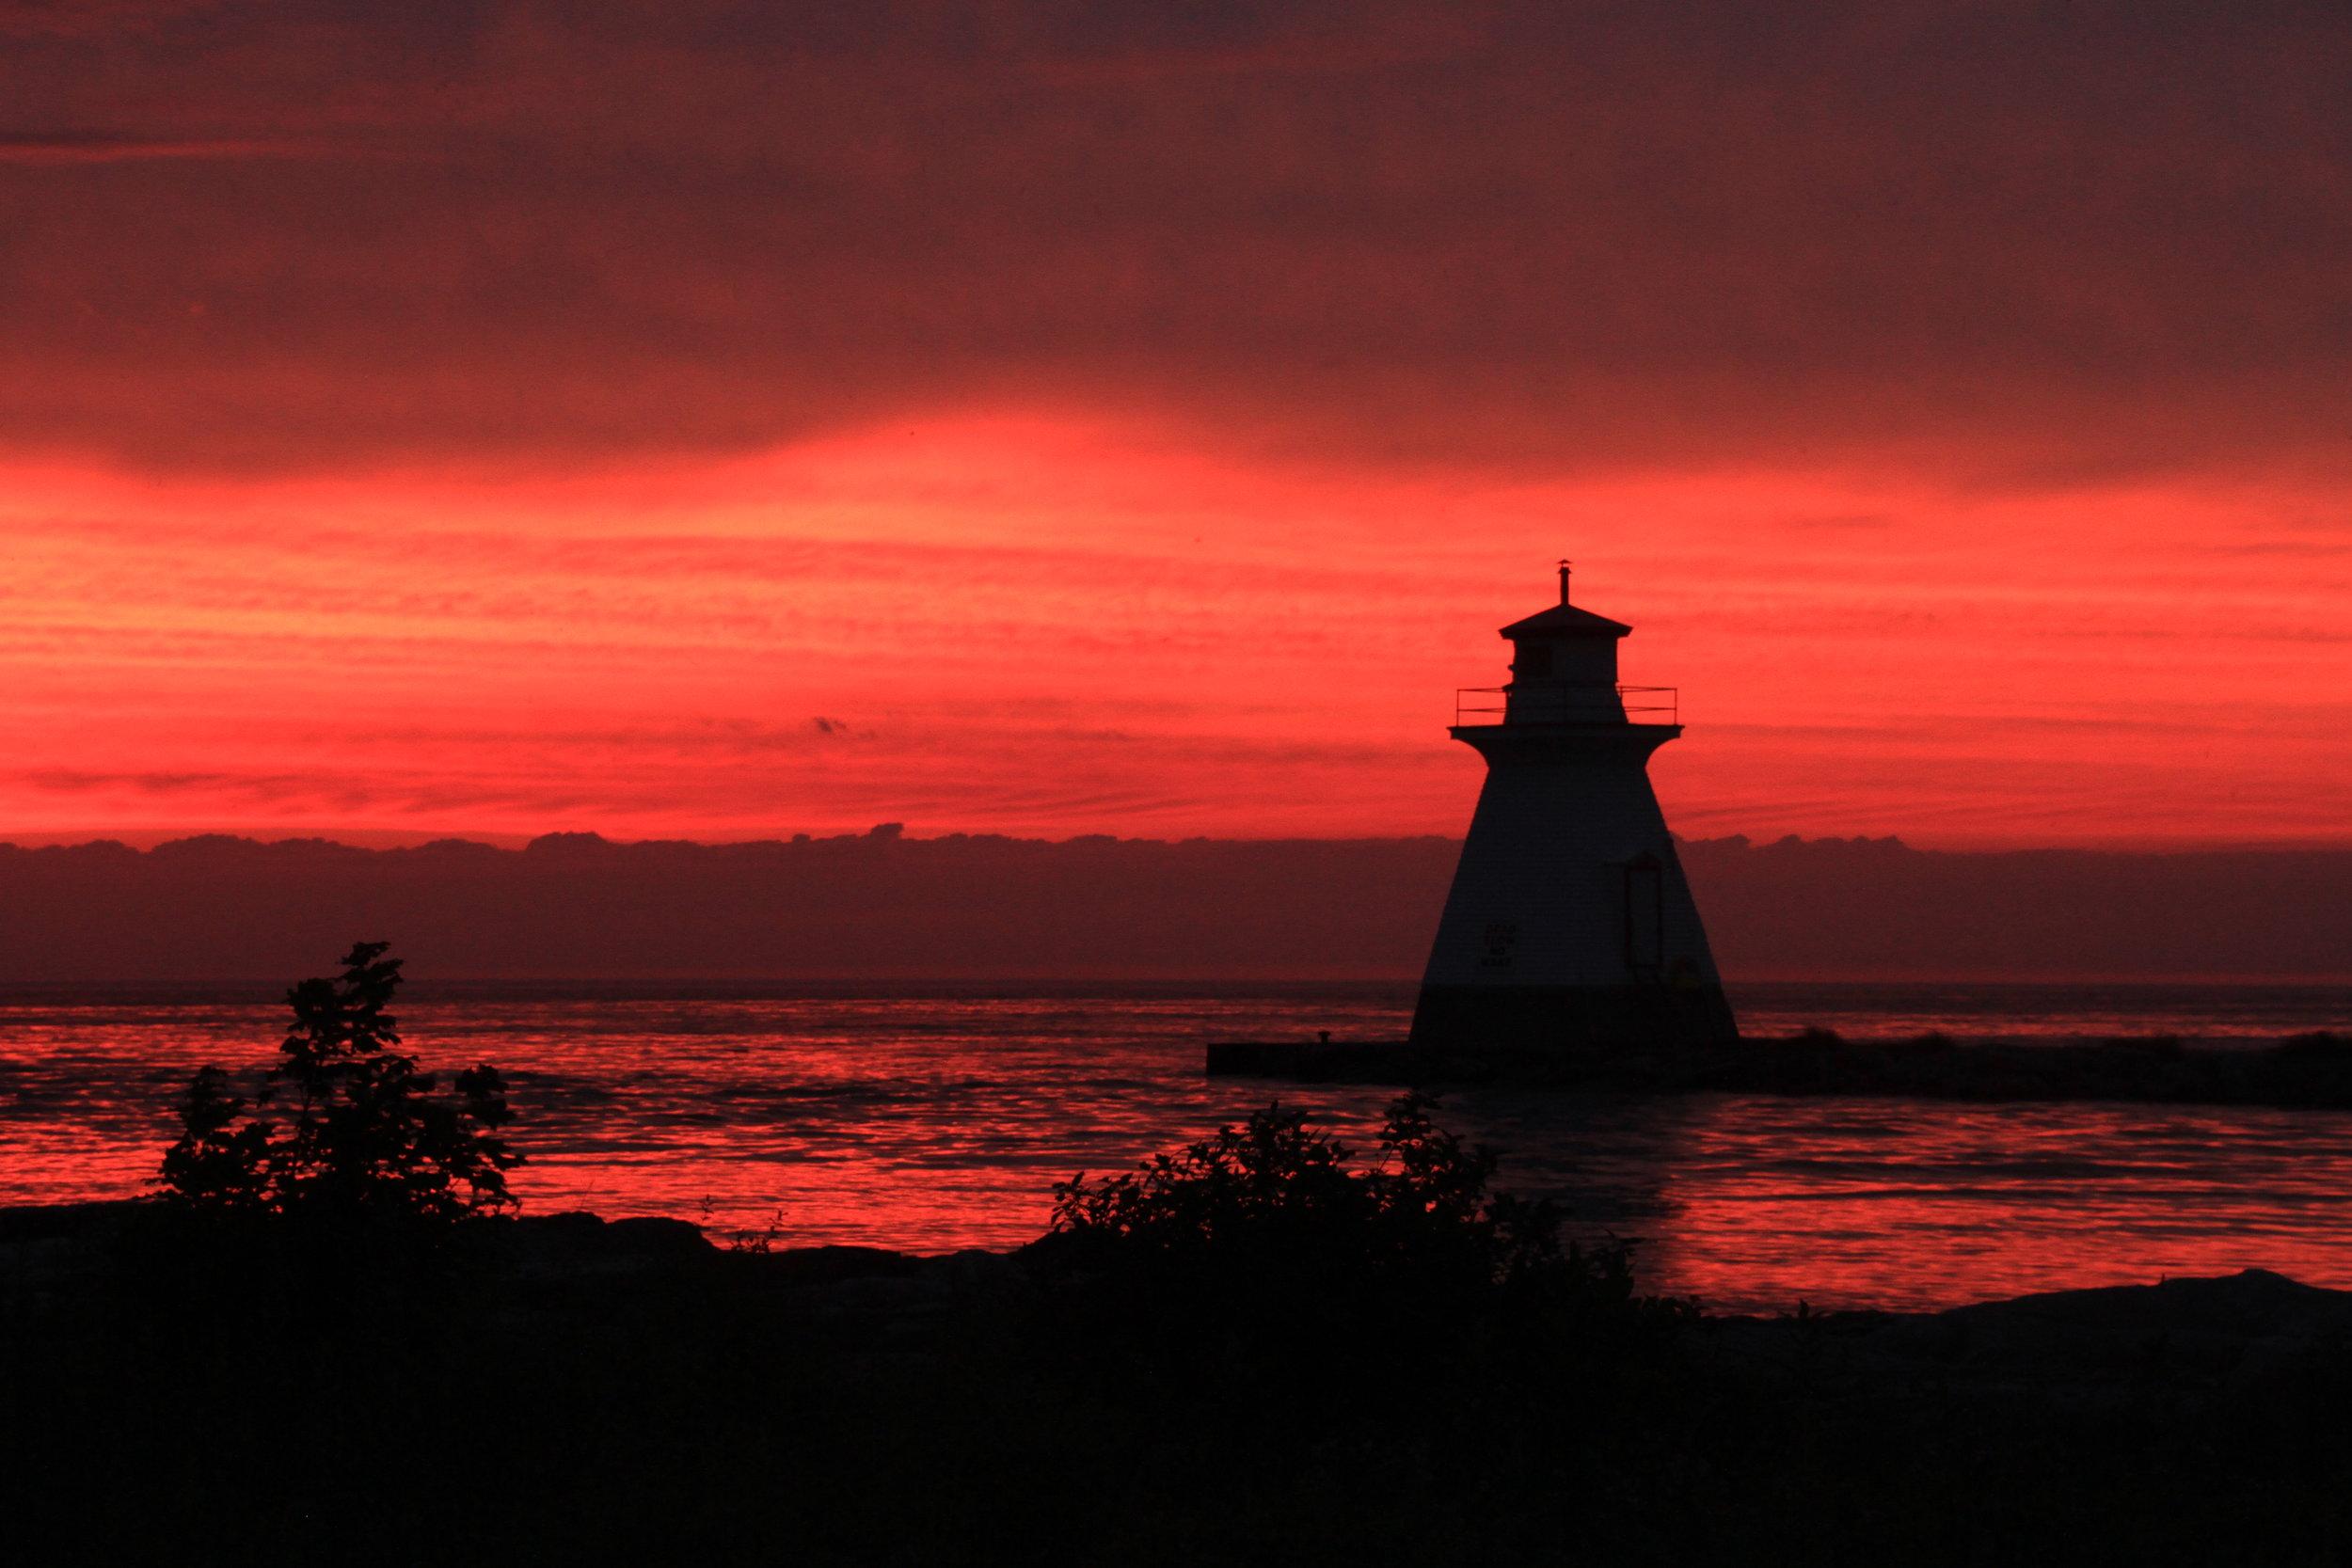 Sunset at Southampton, Ontario